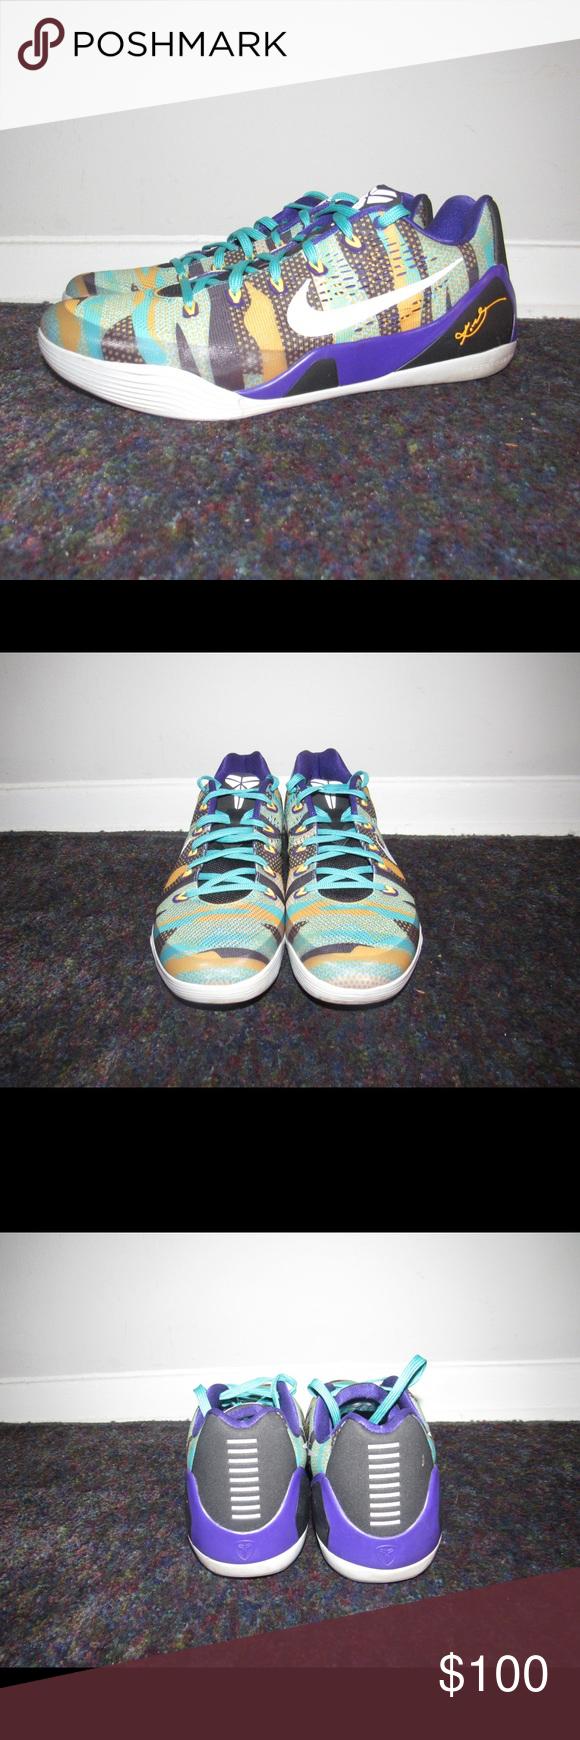 new product 2abff c41e9 Nike Kobe 9 IX EM Pop Art Basketball Shoes Lakers - Nike Kobe 9 IX EM